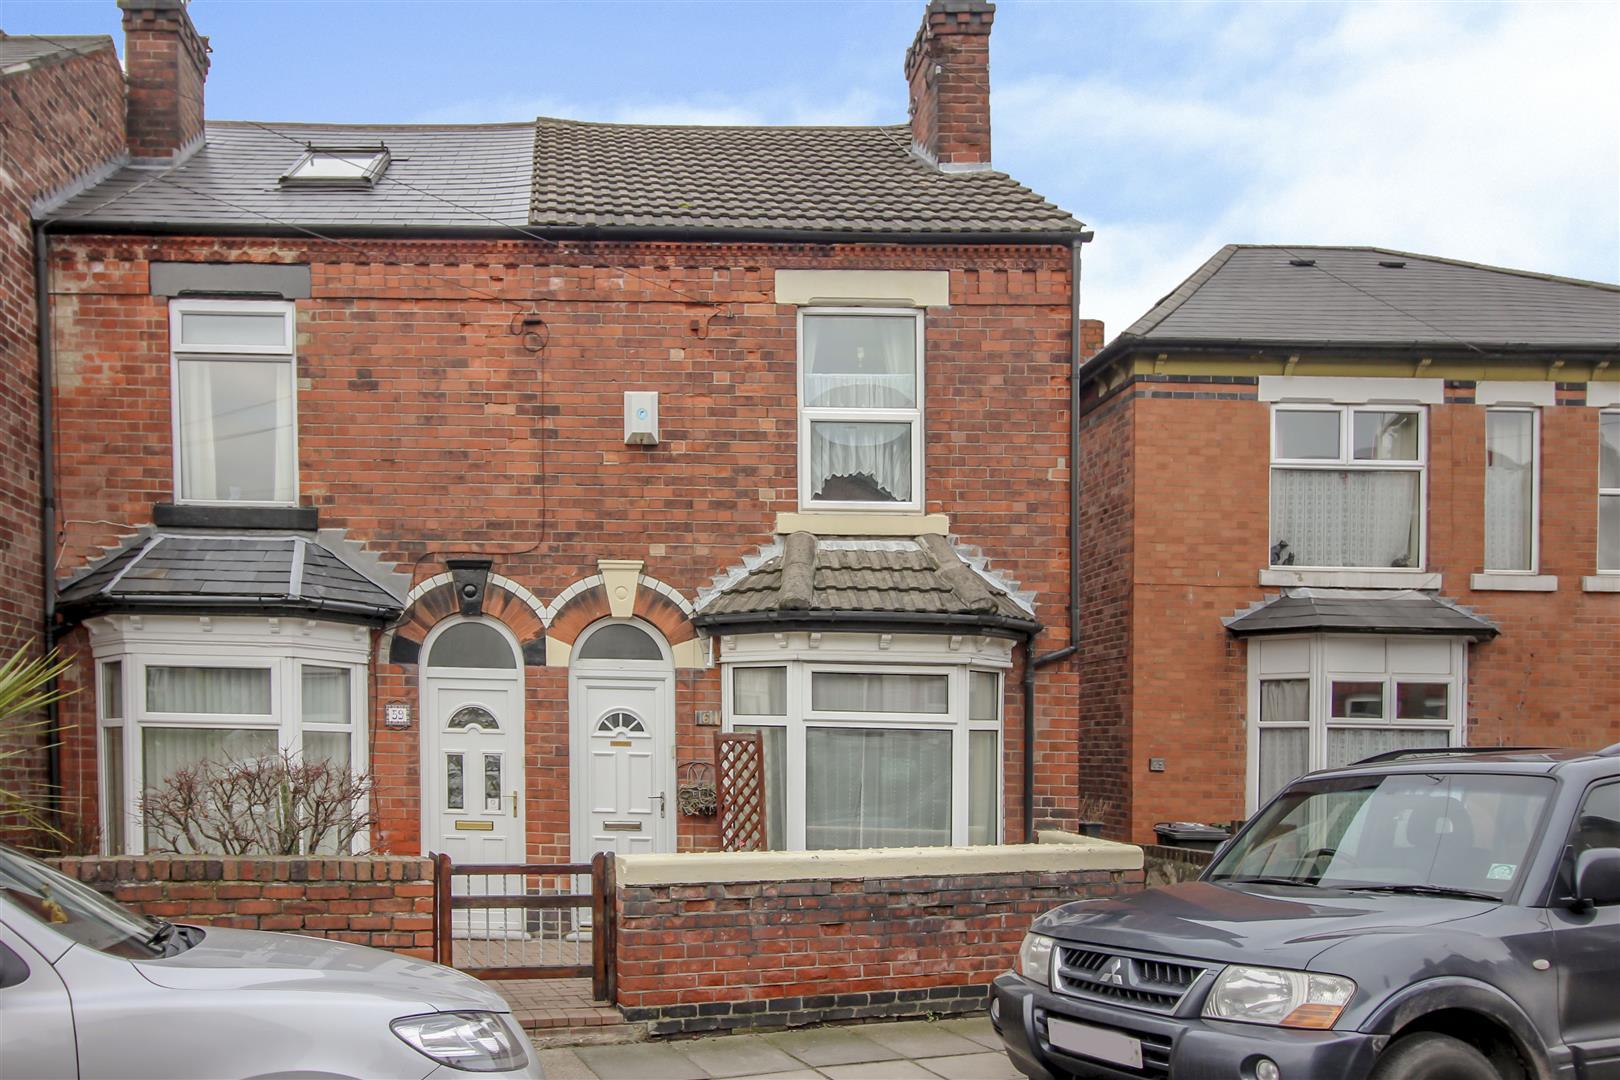 3 Bedrooms House for sale in Brookhill Street, Stapleford, Nottingham